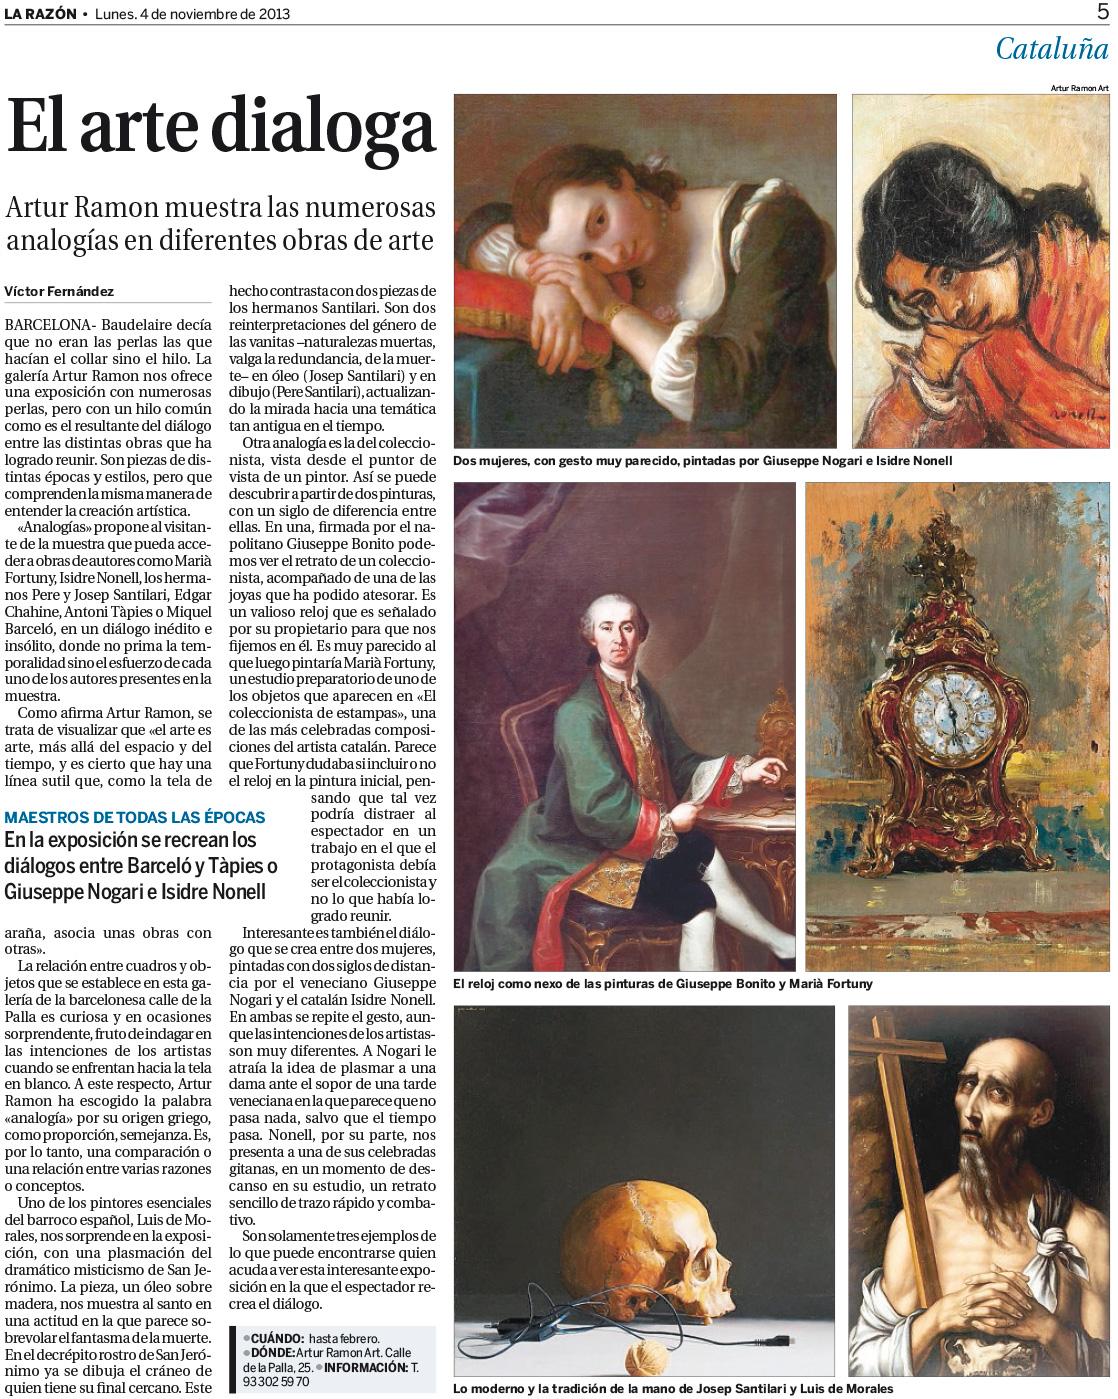 El arte dialoga (La Razón)